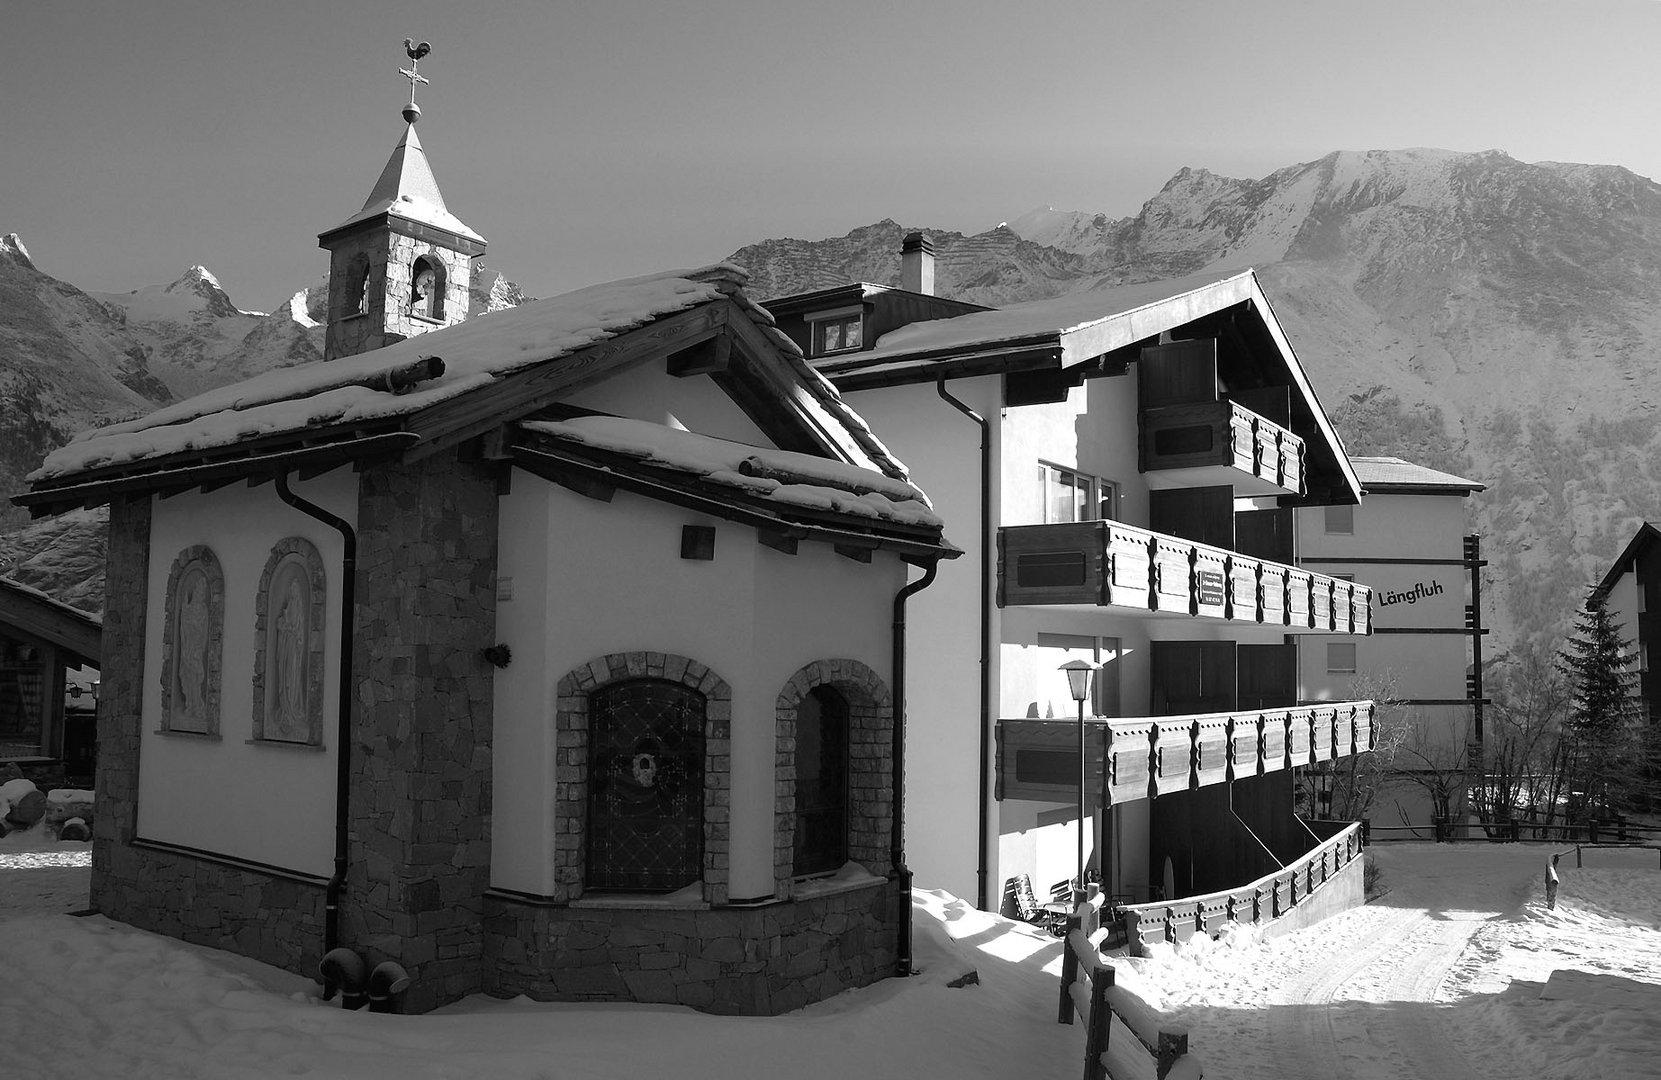 Petite chapelle à Saas-Fee (Suisse)